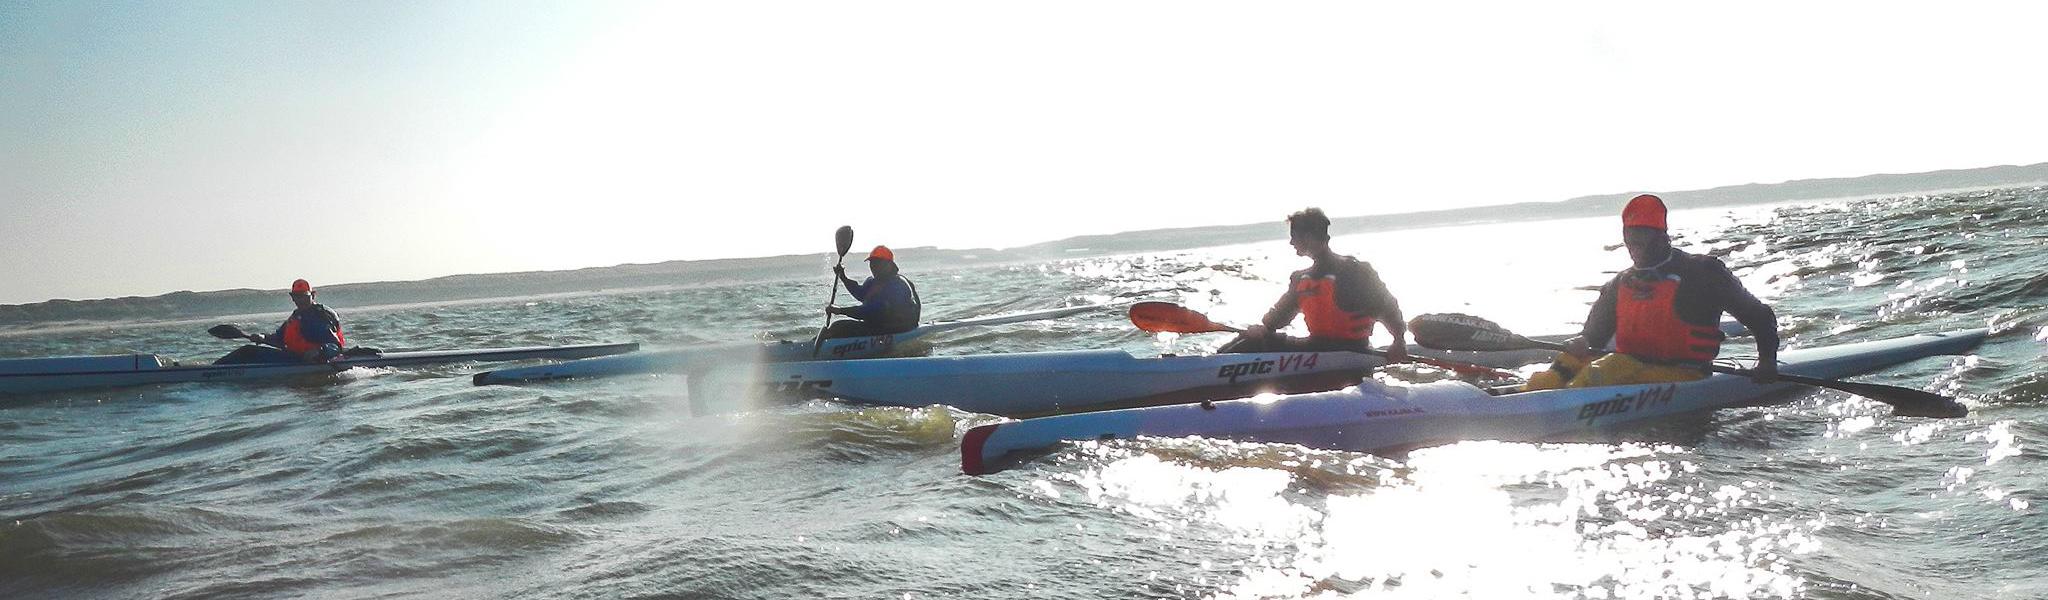 surfski 4smal